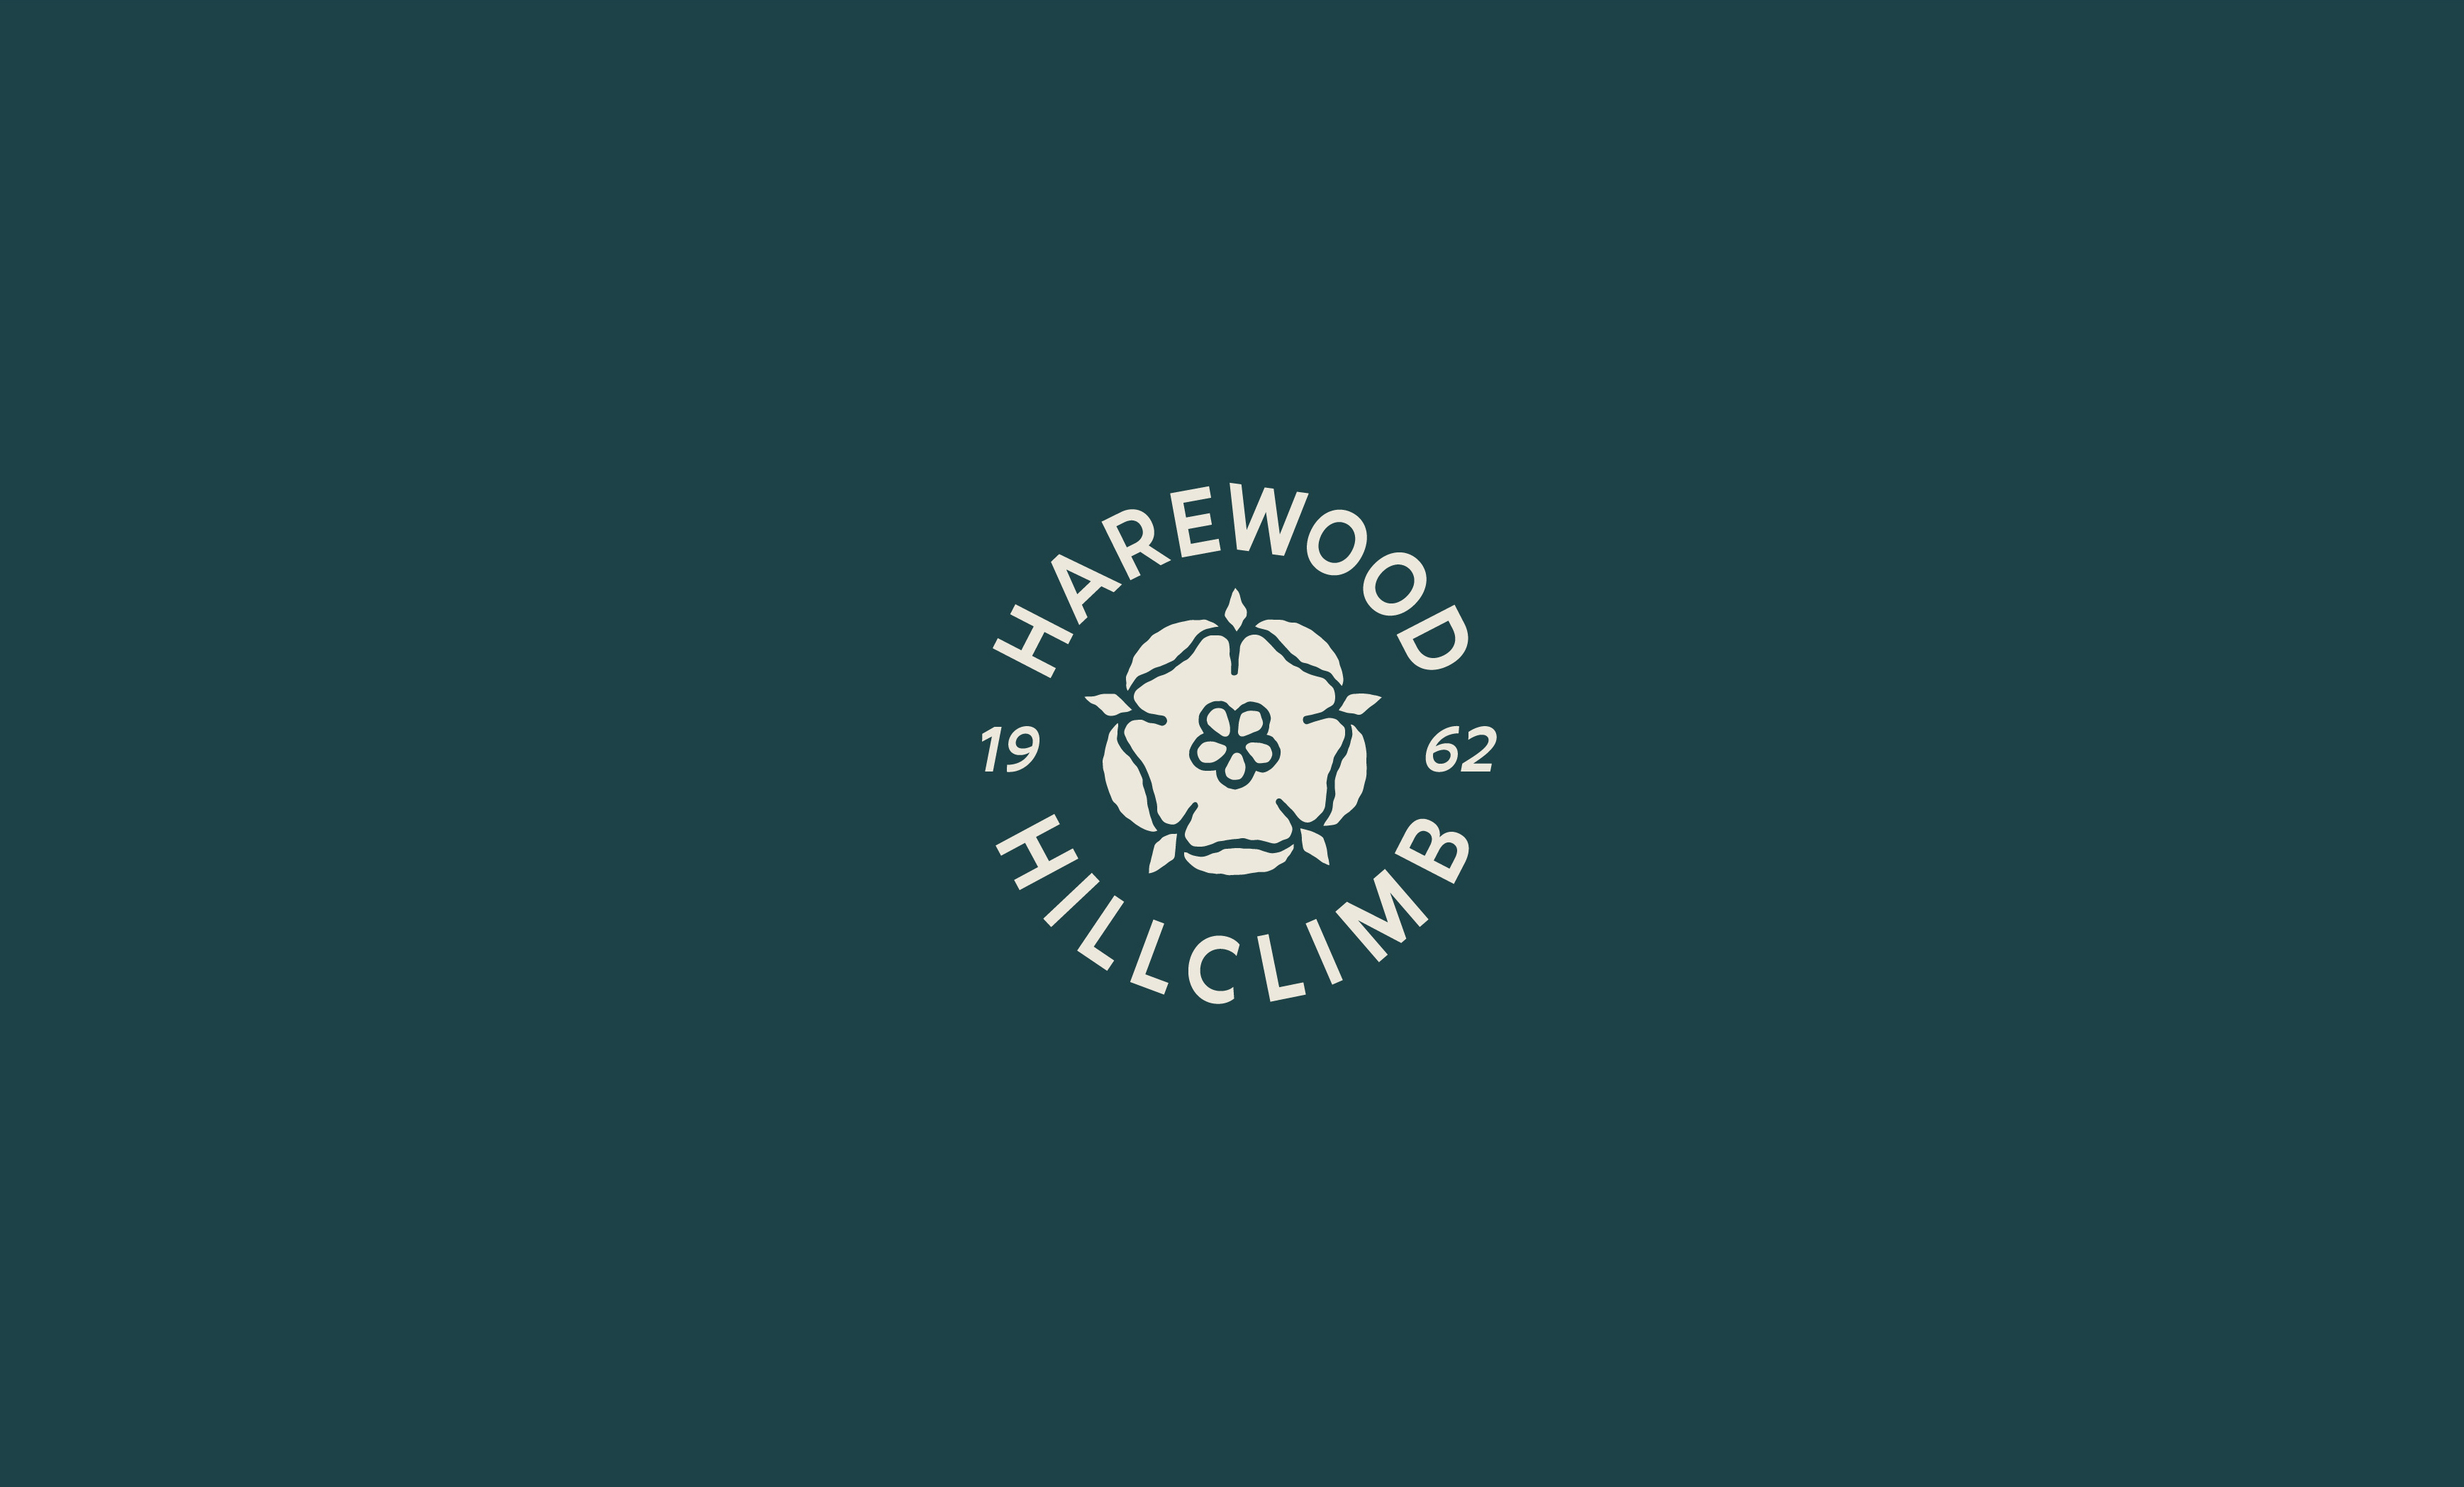 harewood hillclimb logo